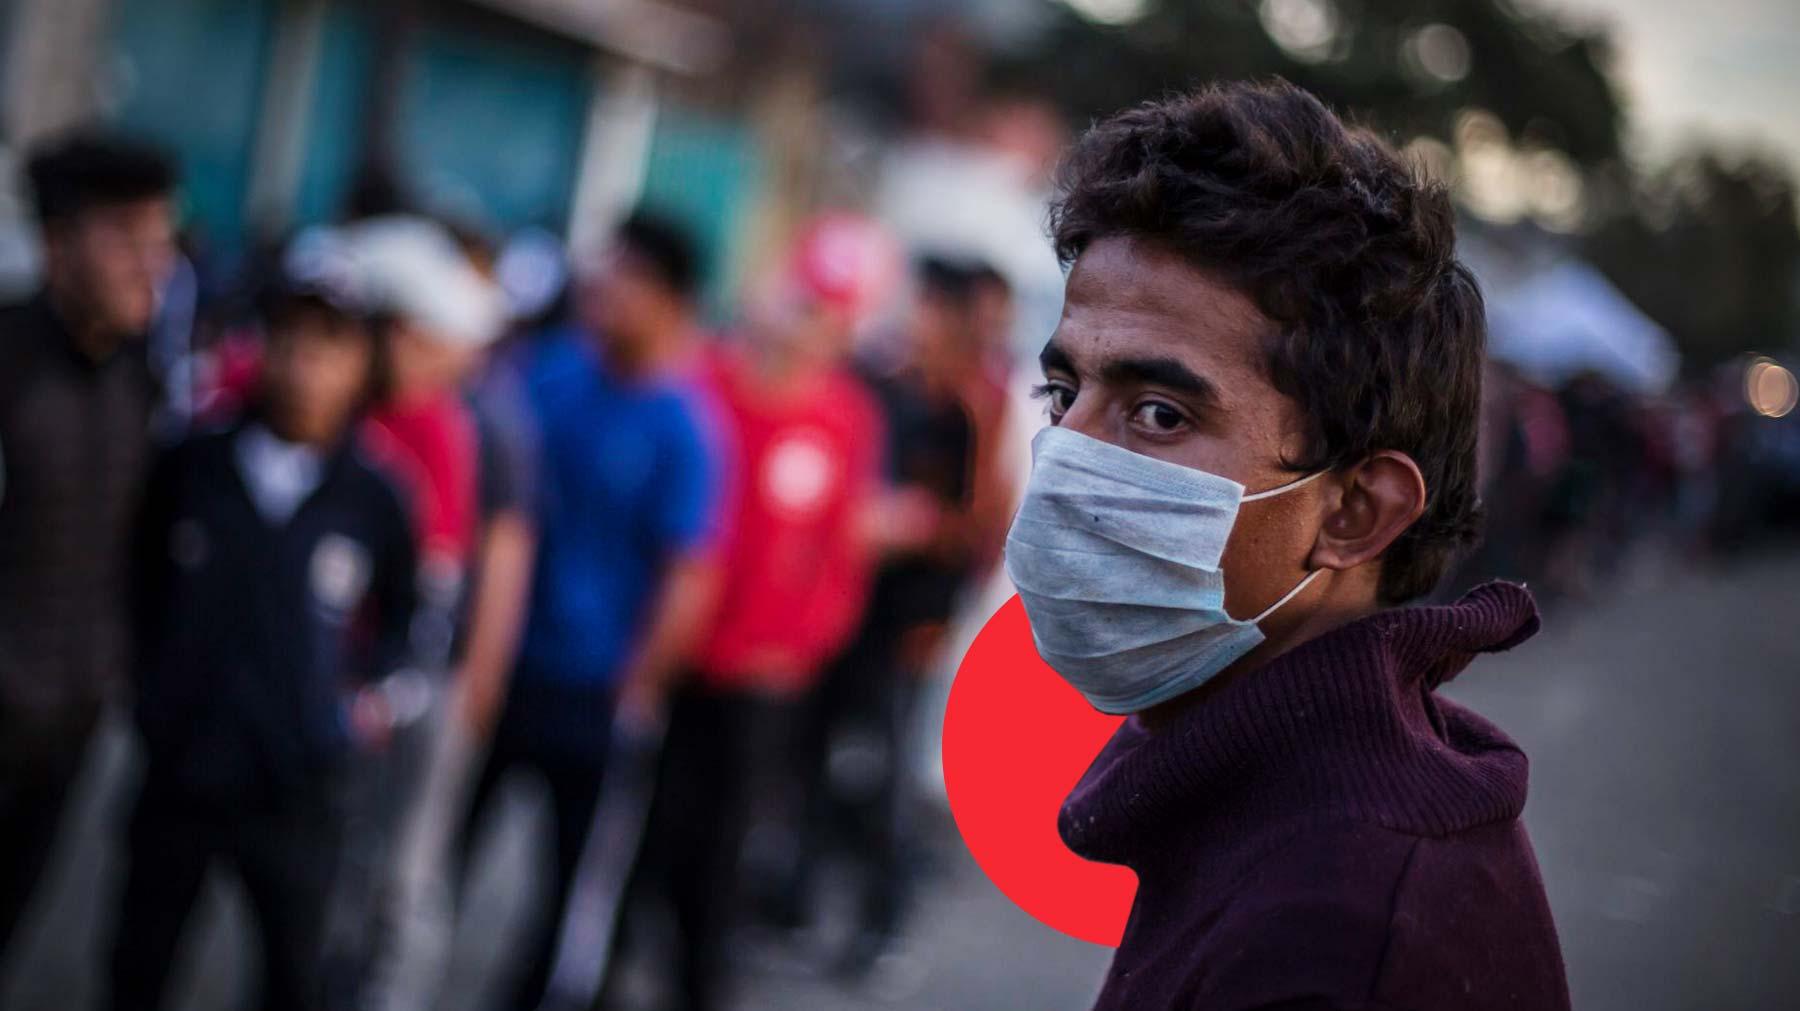 Migrantes quedan desamparados ante miedo a coronavirus